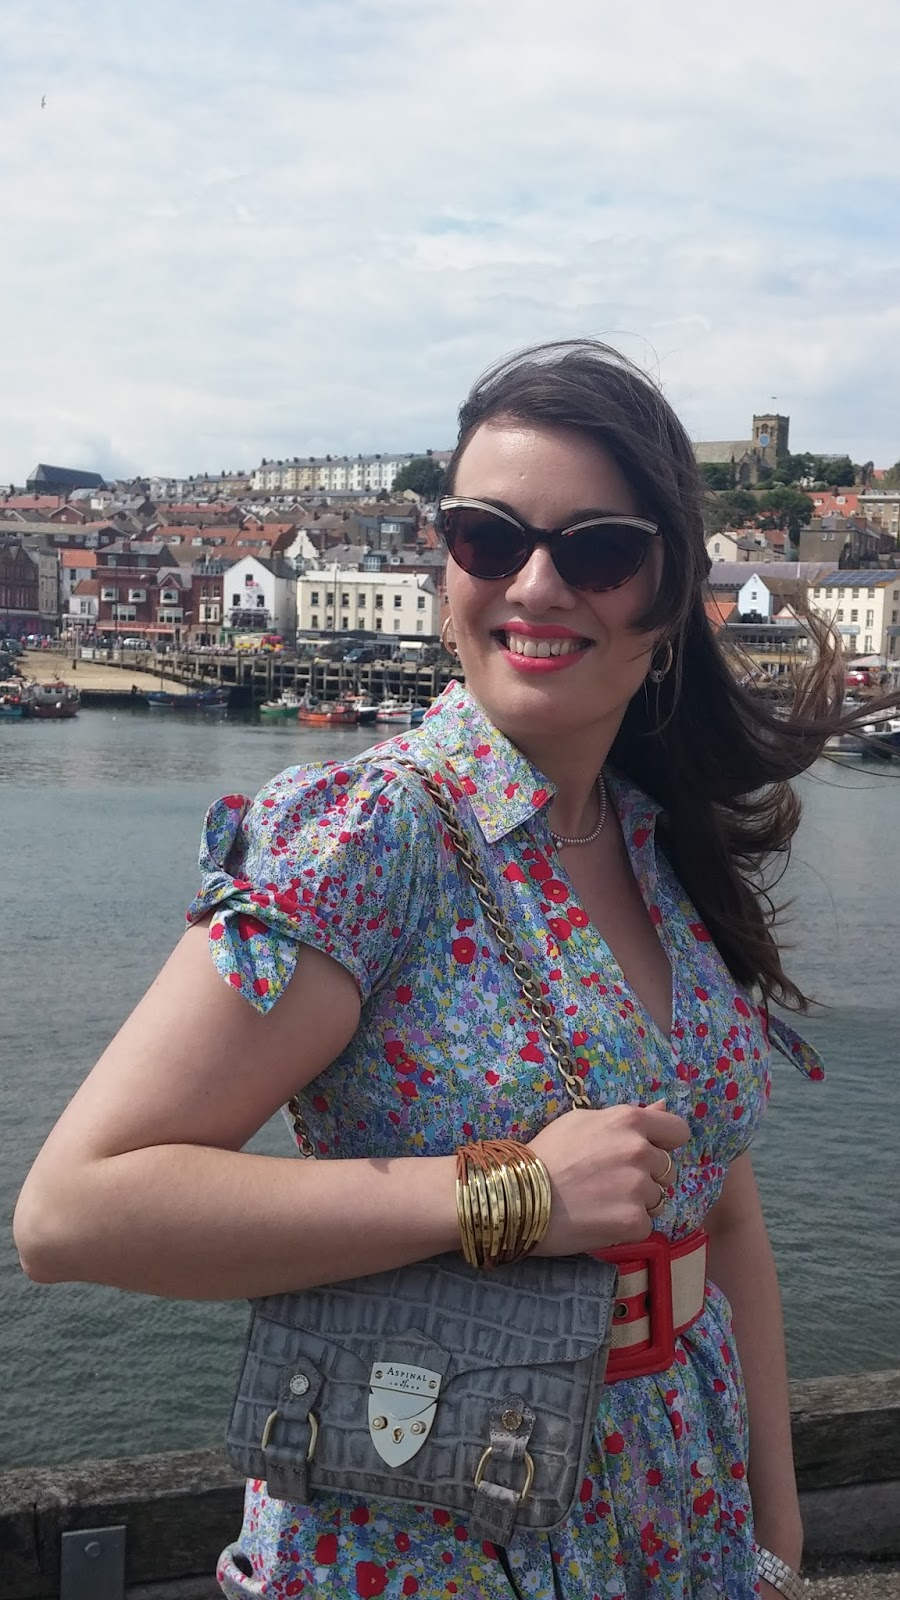 UK vintage style blogger